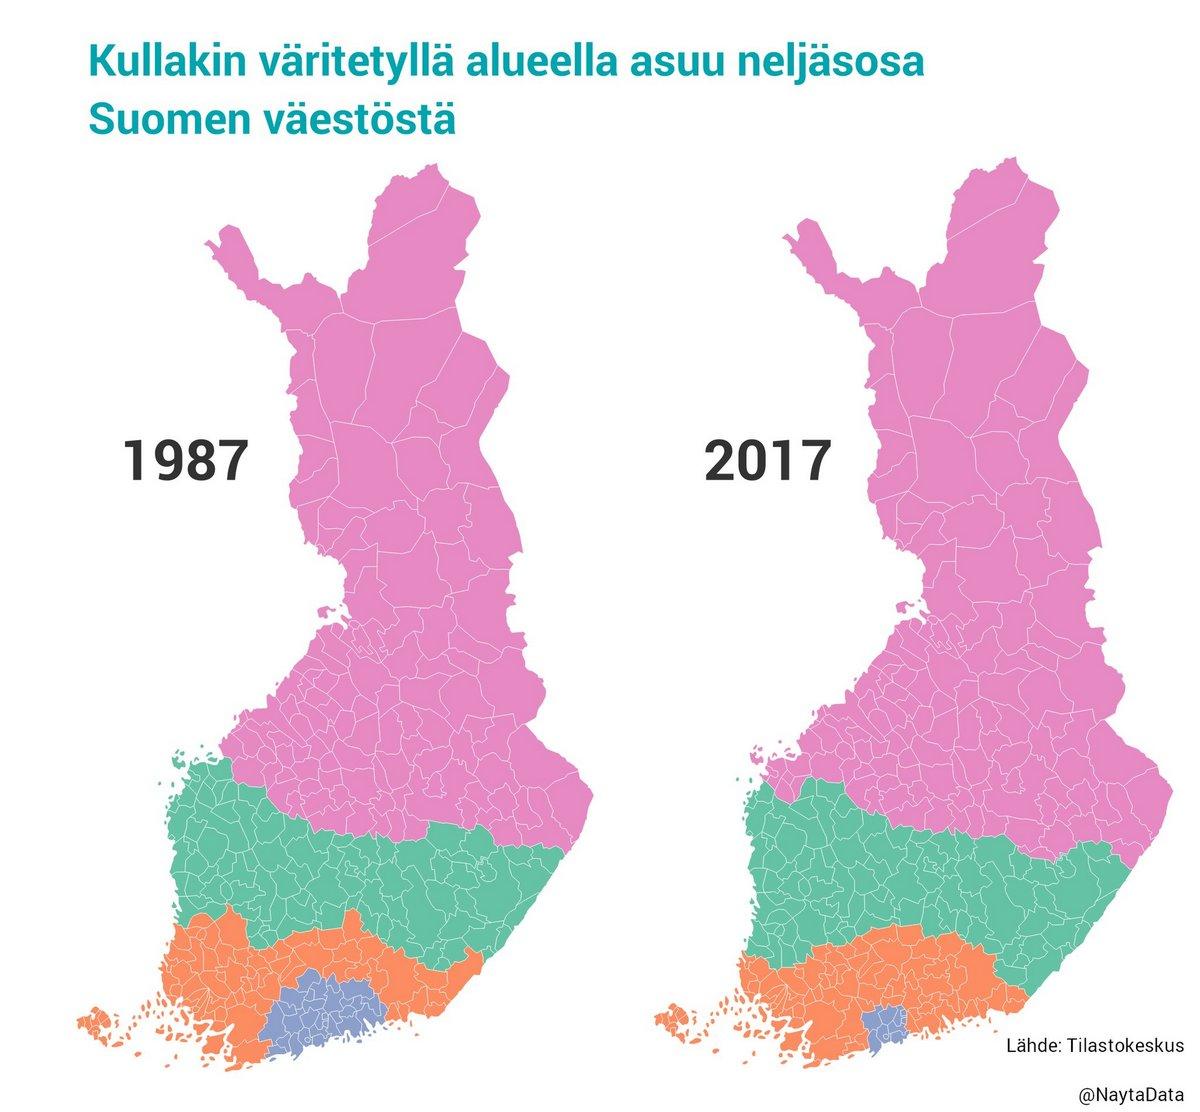 Population distribution in Finland (1987 vs 2017))